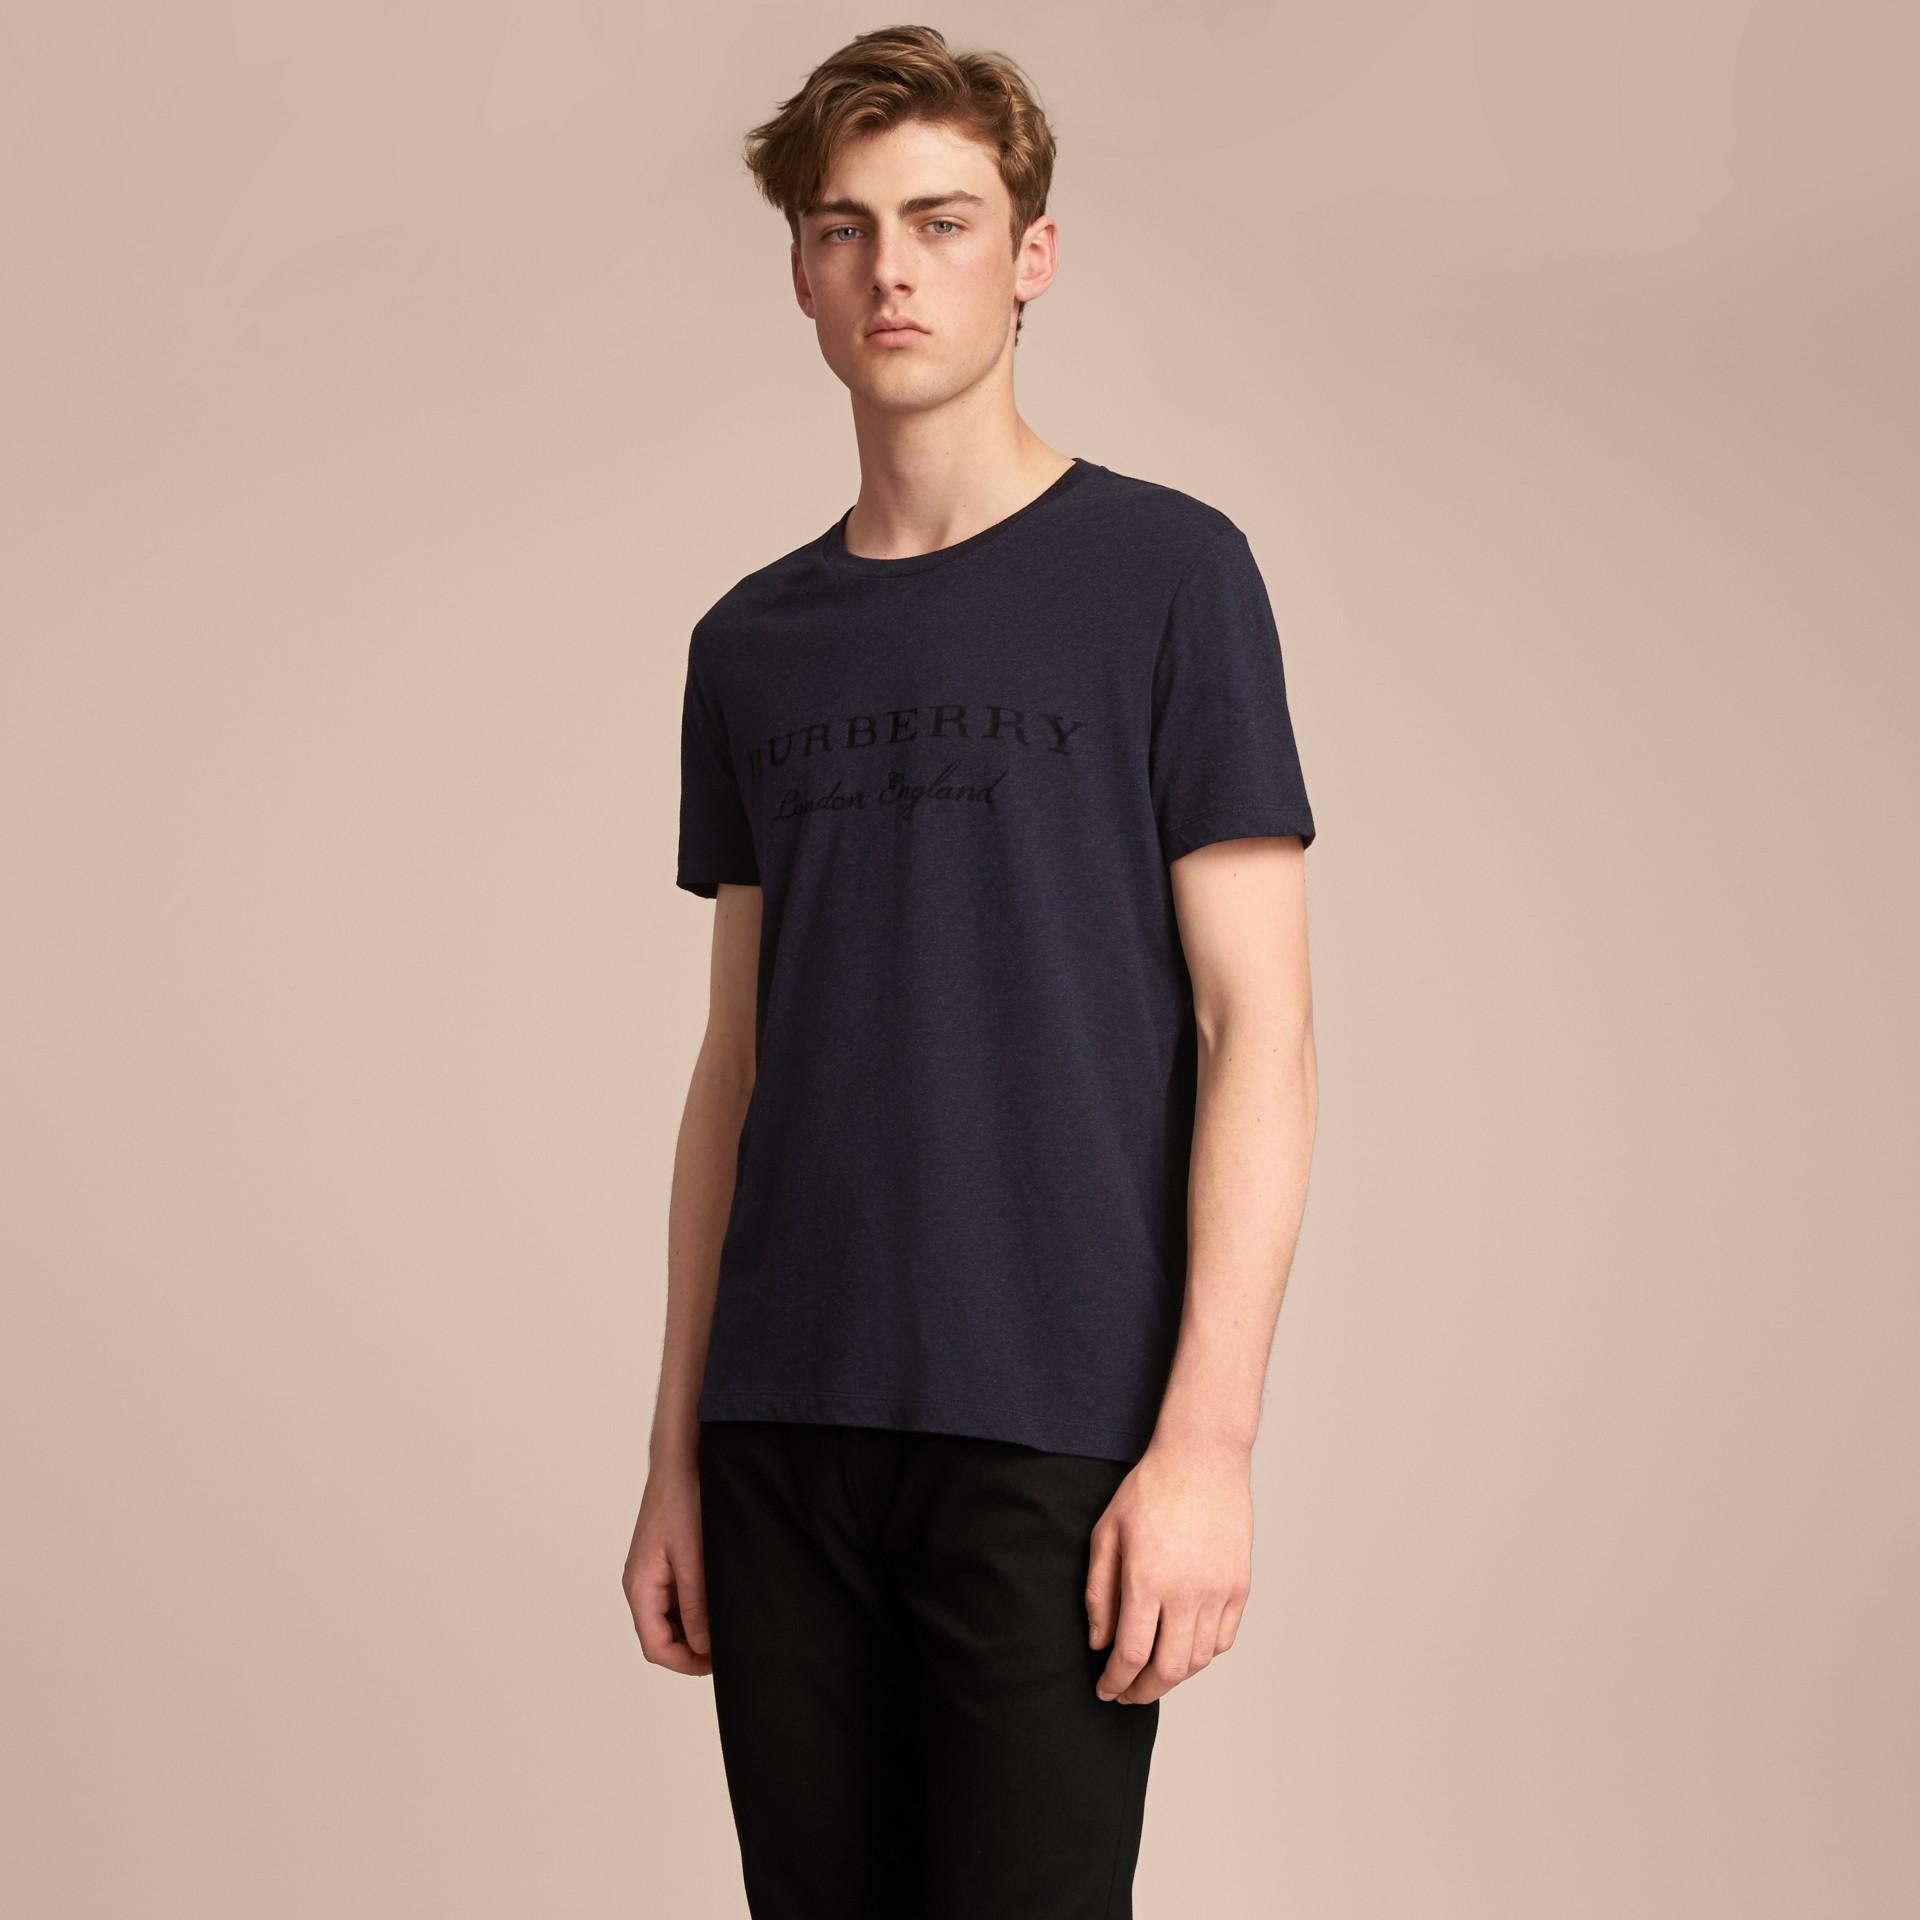 Devoré Cotton Jersey T-shirt in Navy Melange - gallery image 6